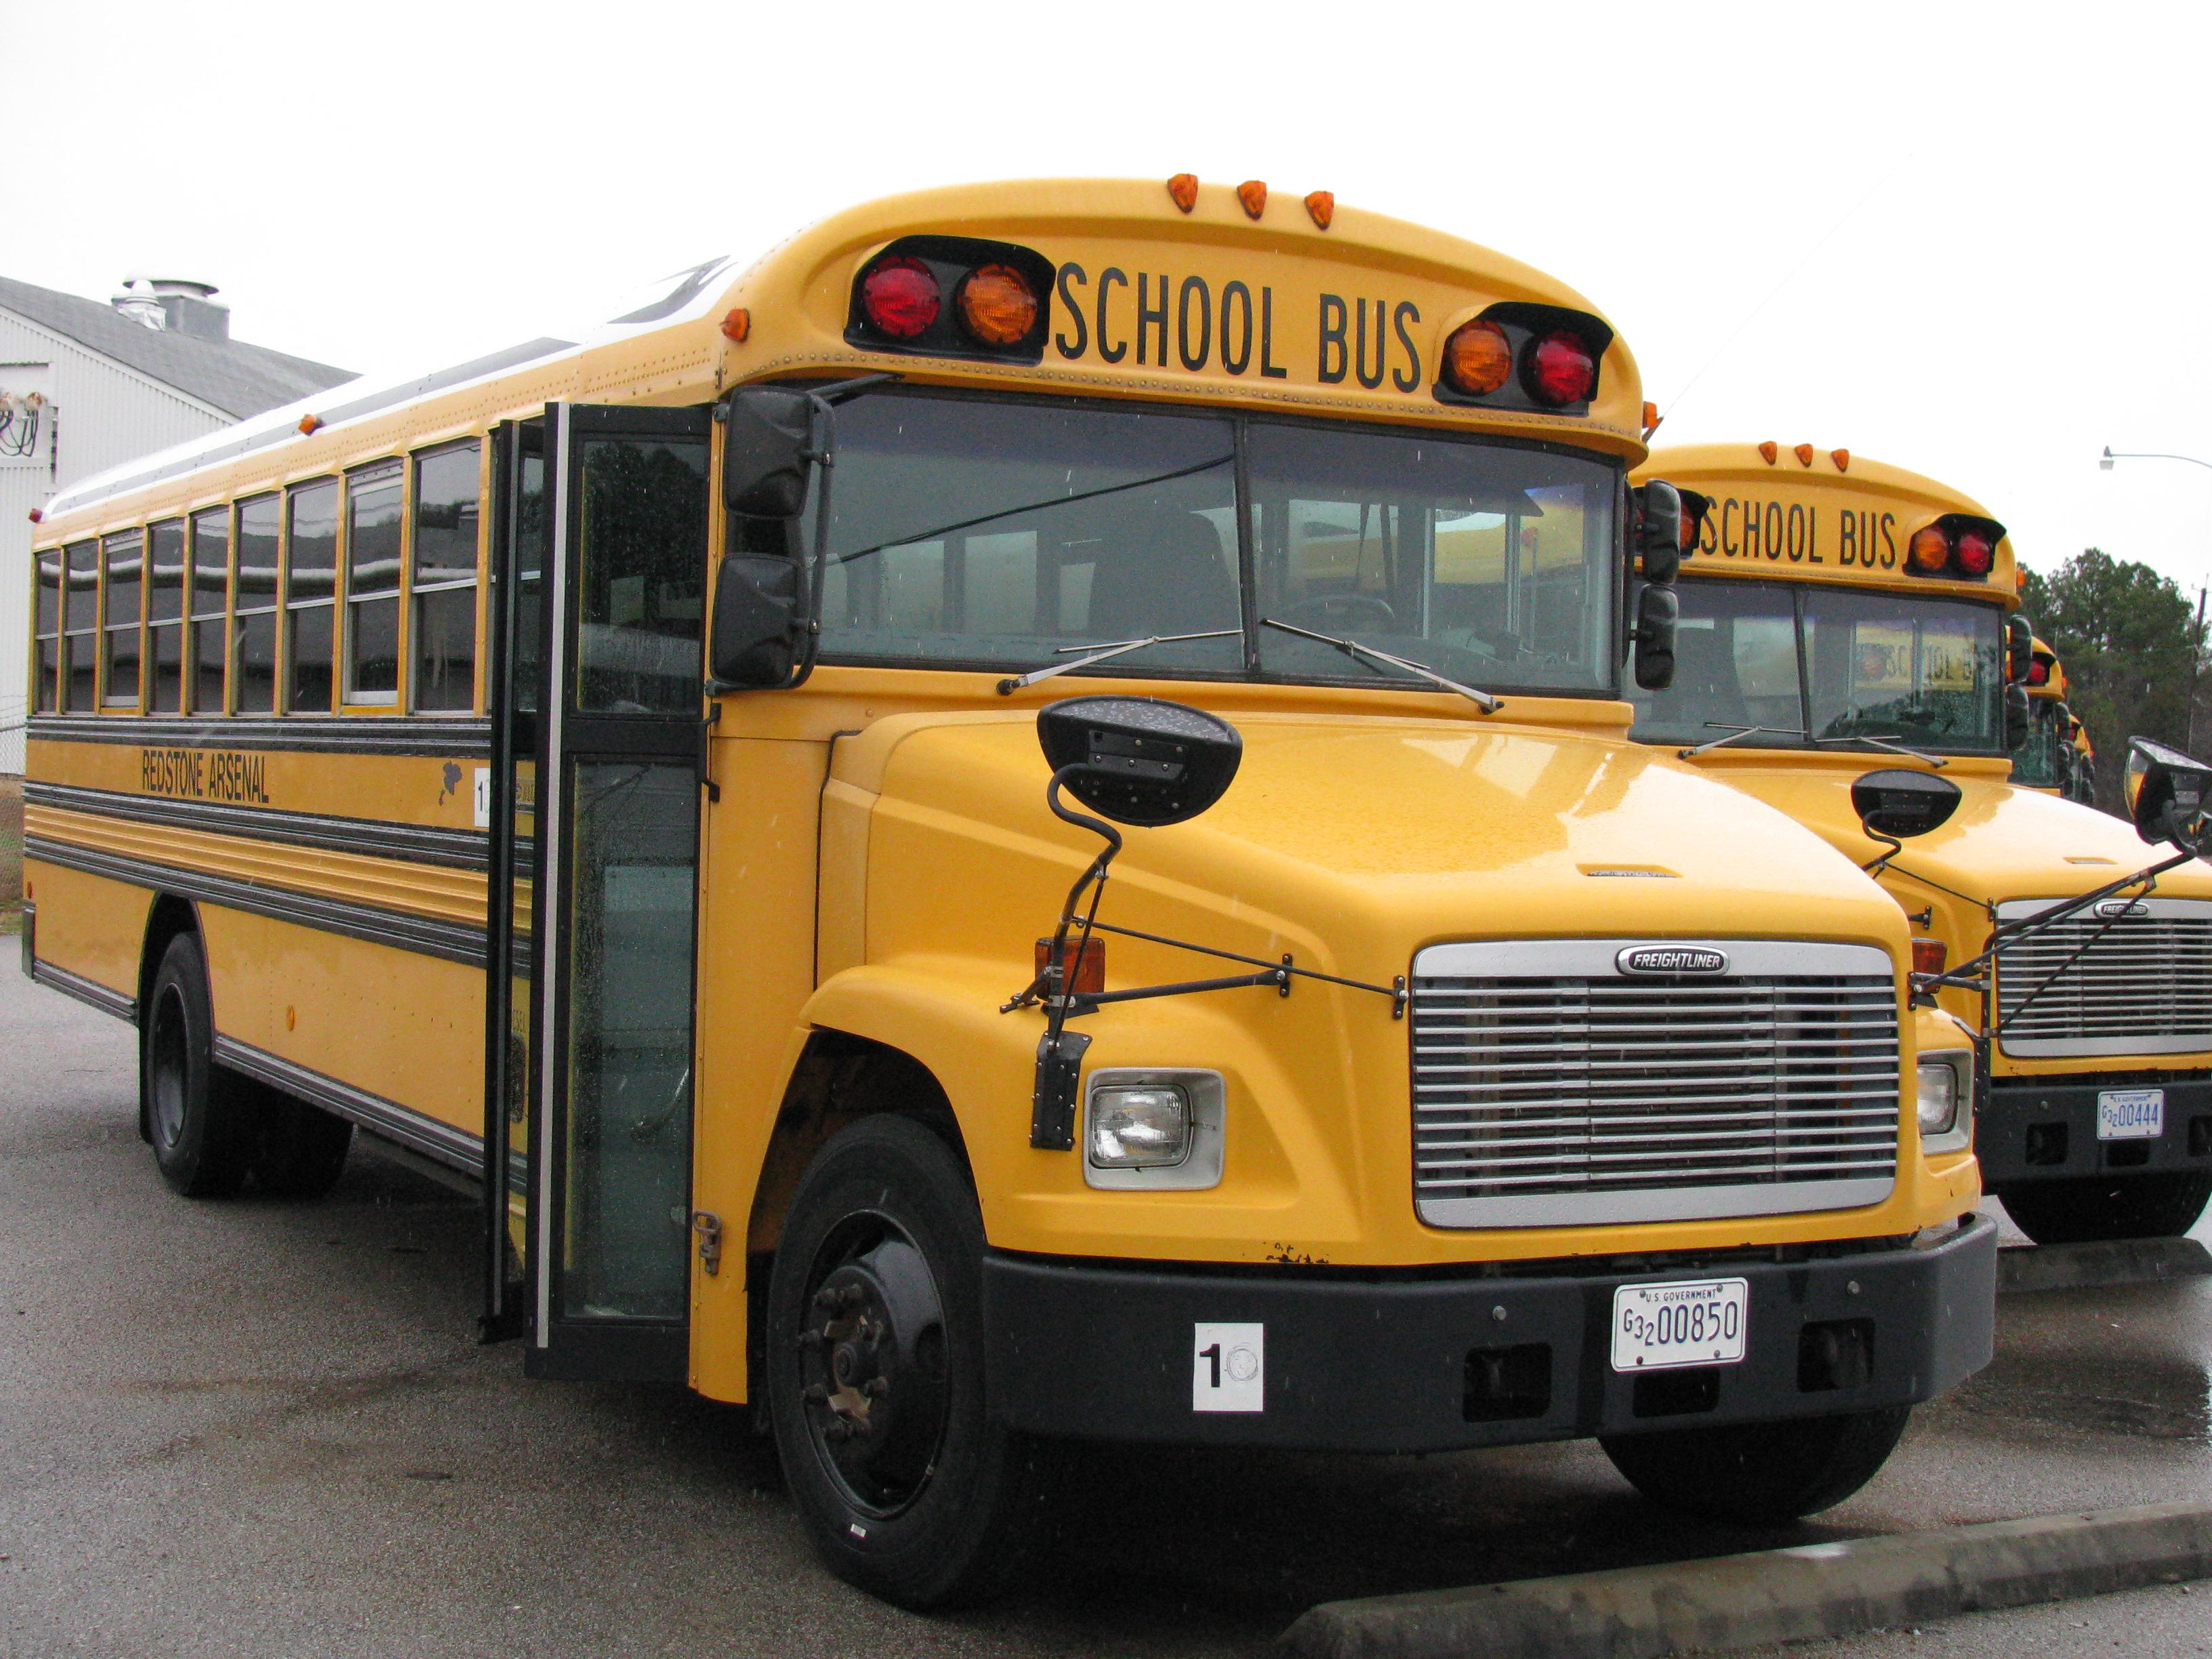 School Bus Images Crazy Gallery 3264x2448